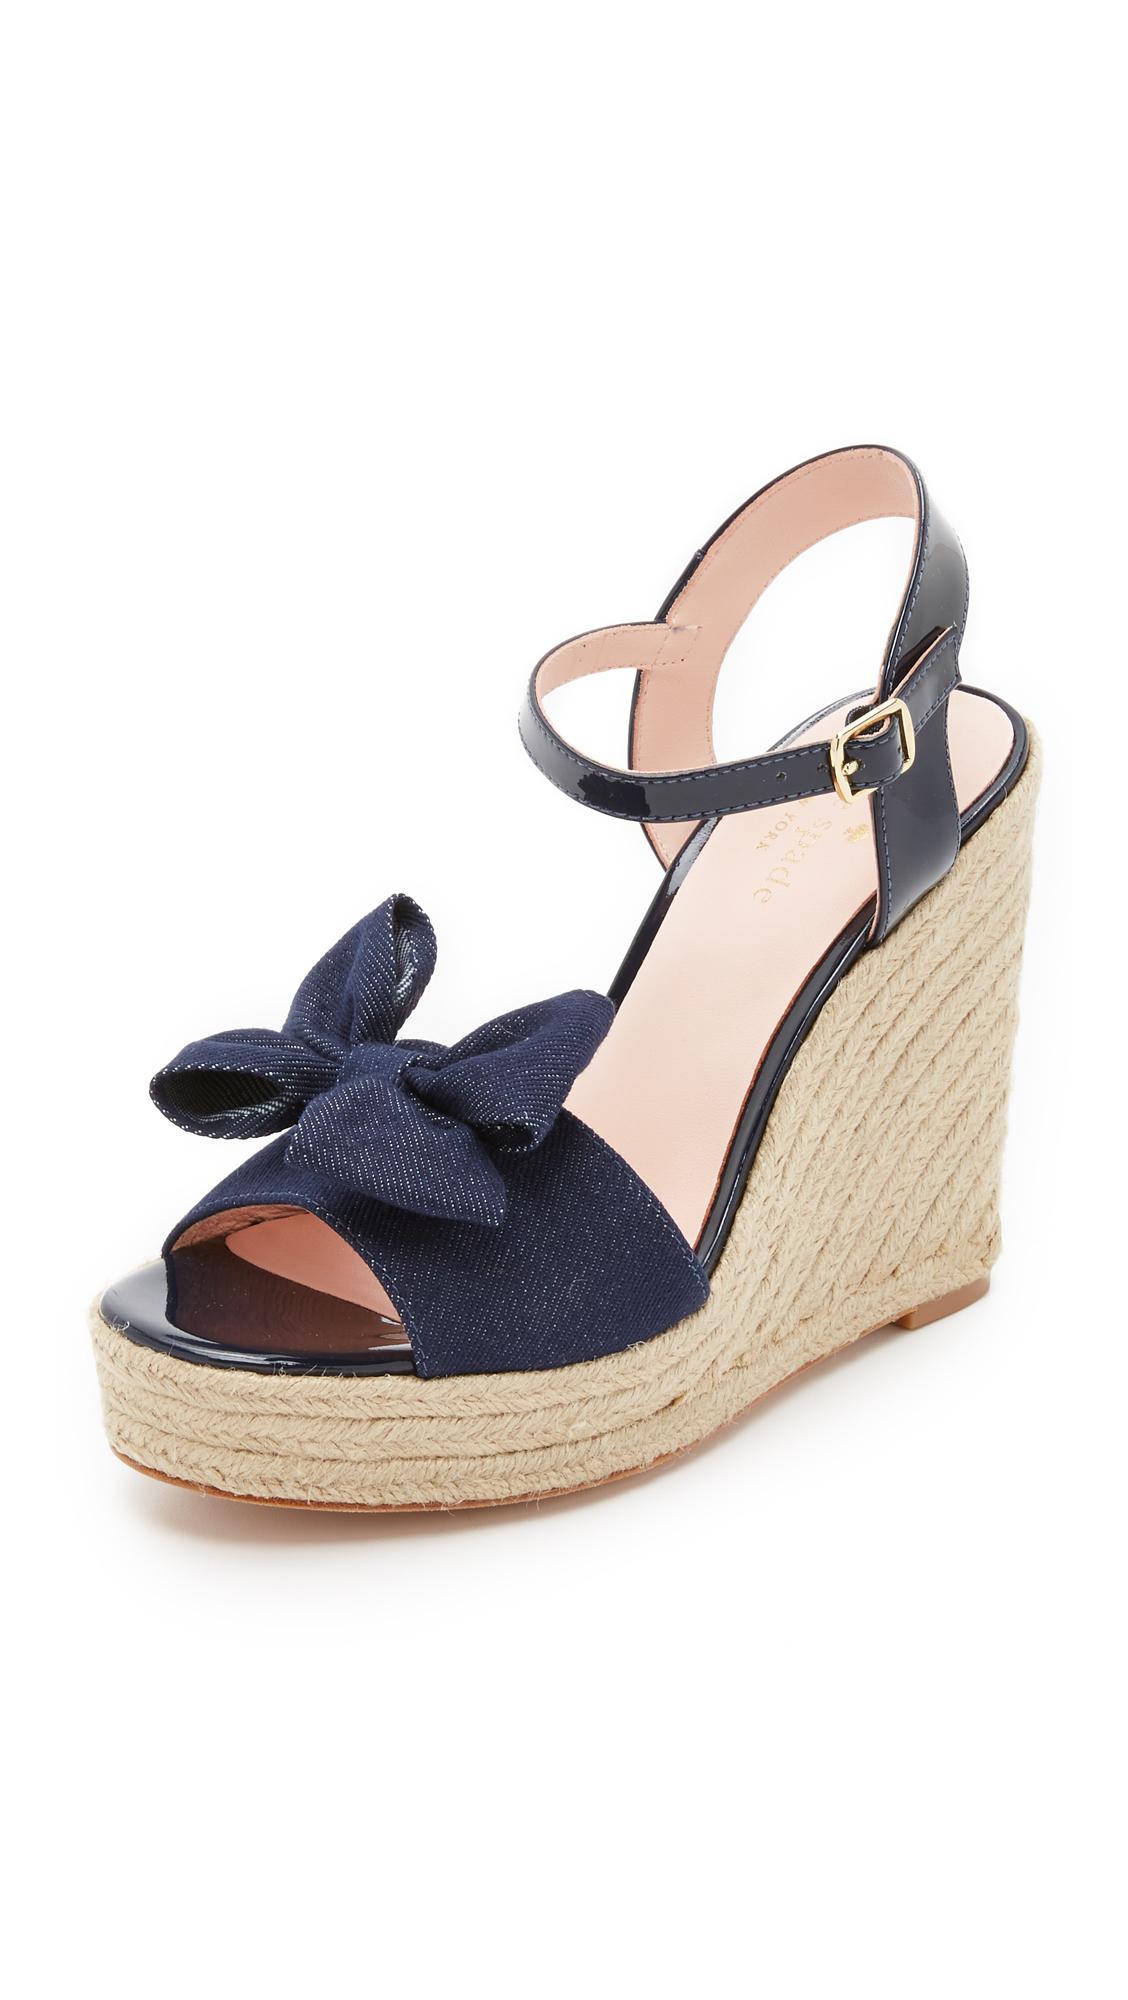 Kate Spade New York Denim Flatform Sandals clearance cheap price Ts35AN